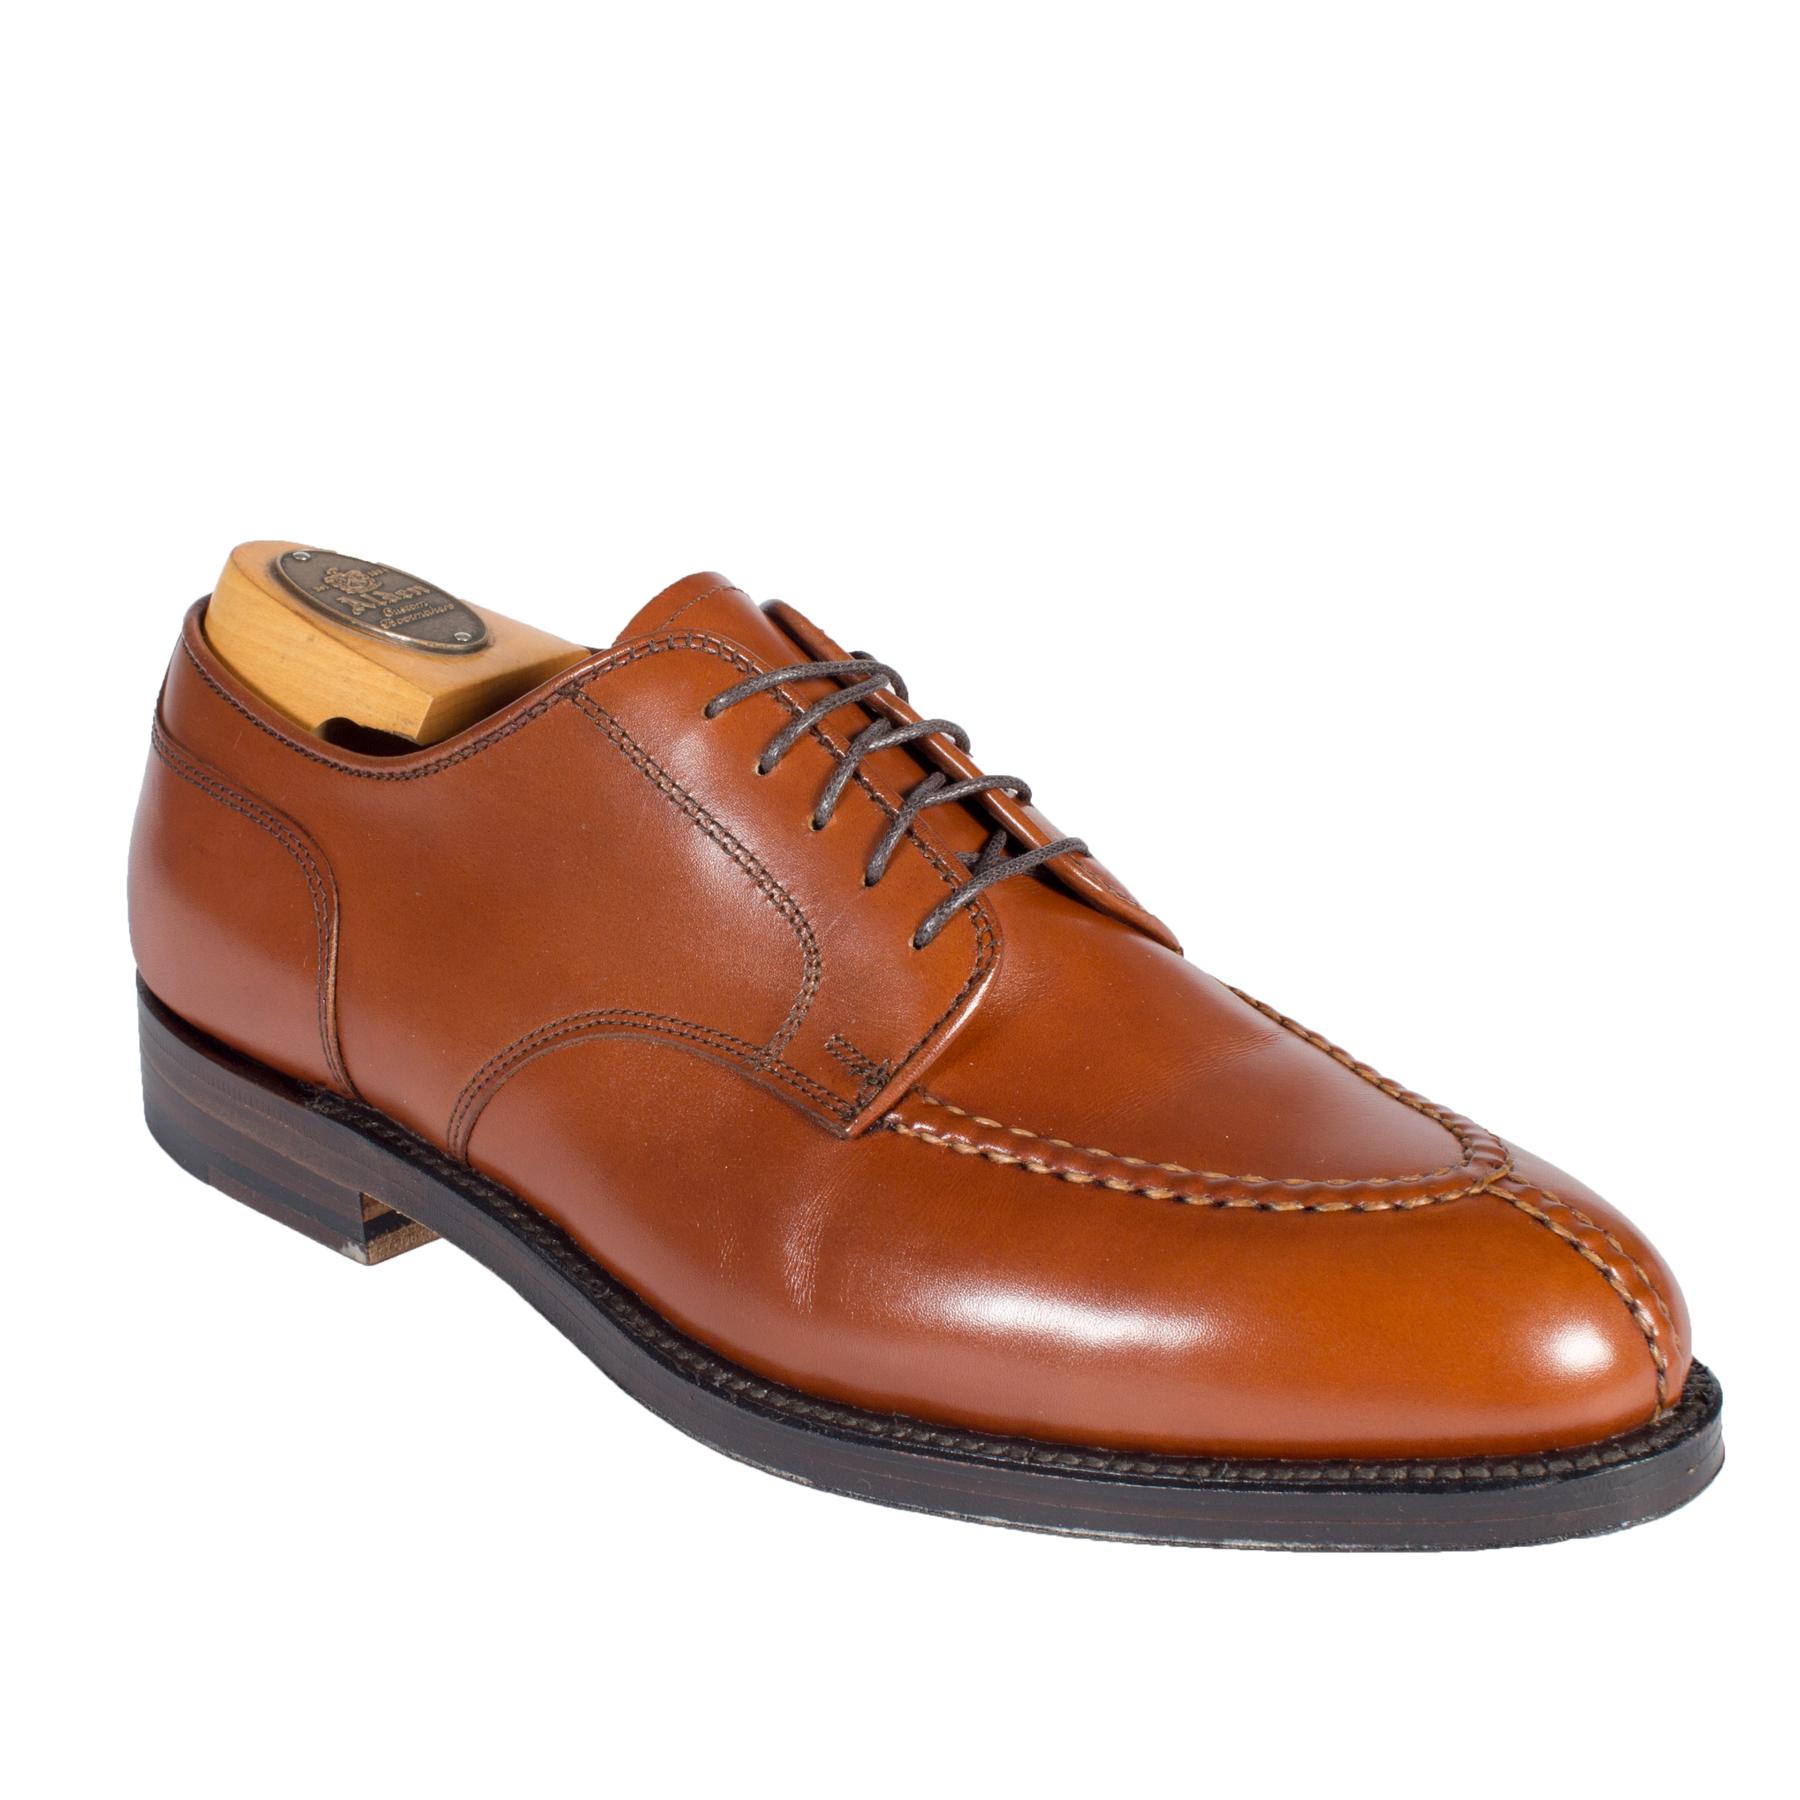 Unlined plain toe bluchersnuff suede29336f alden shoes for The alden